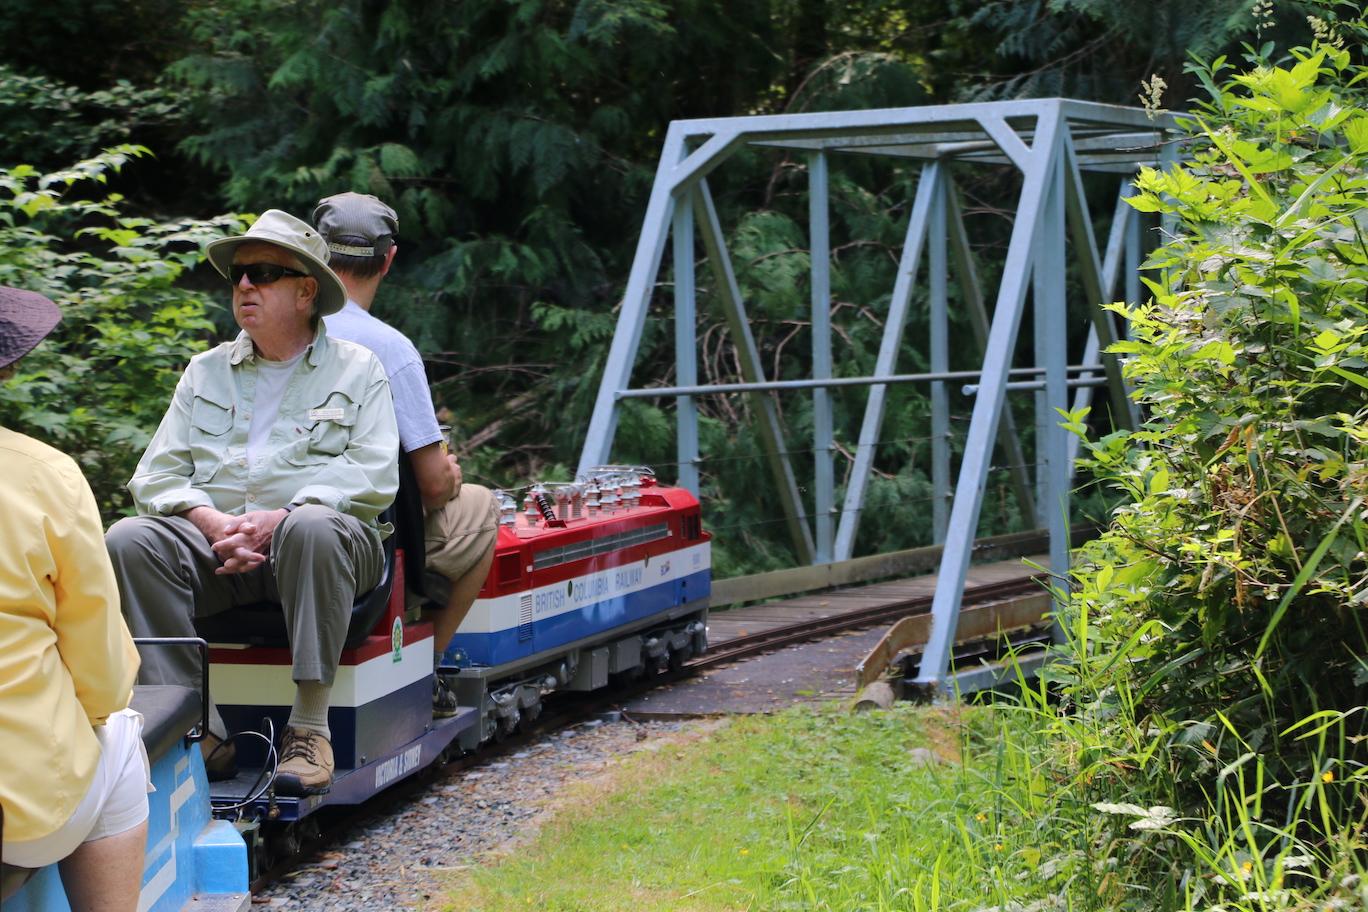 Model train approaching bridge